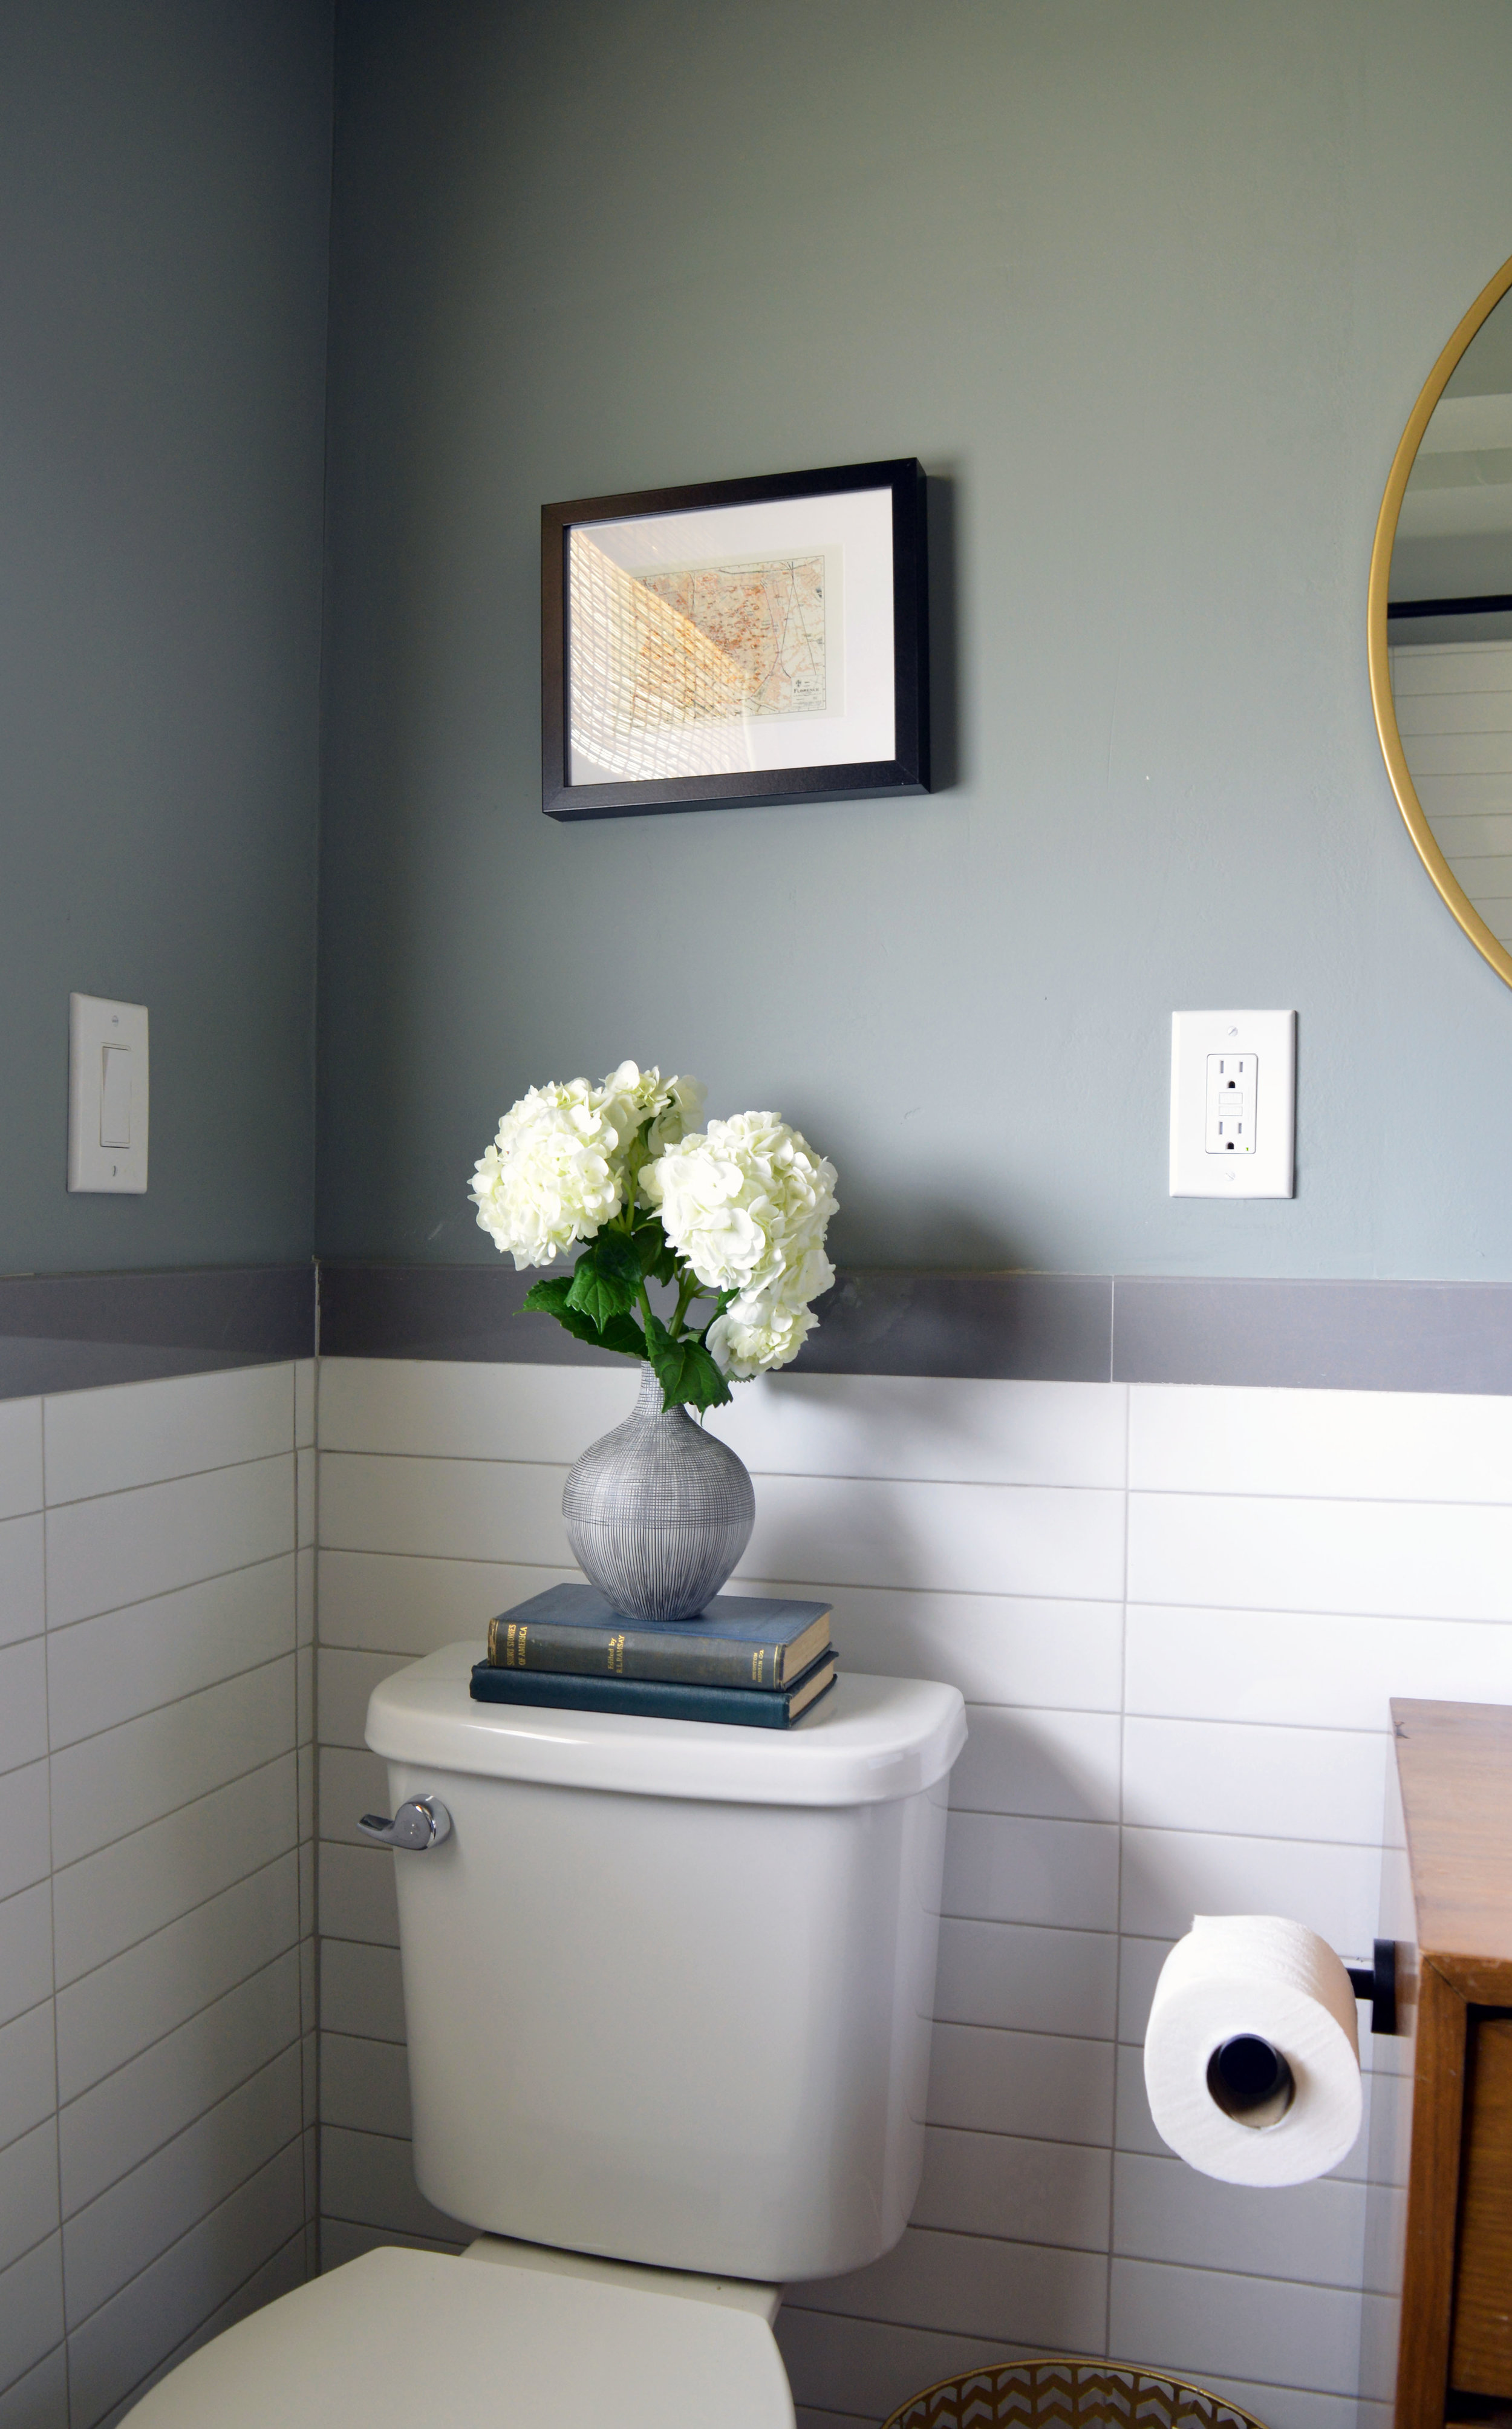 Midcentury Bathroom Renovation with Plants